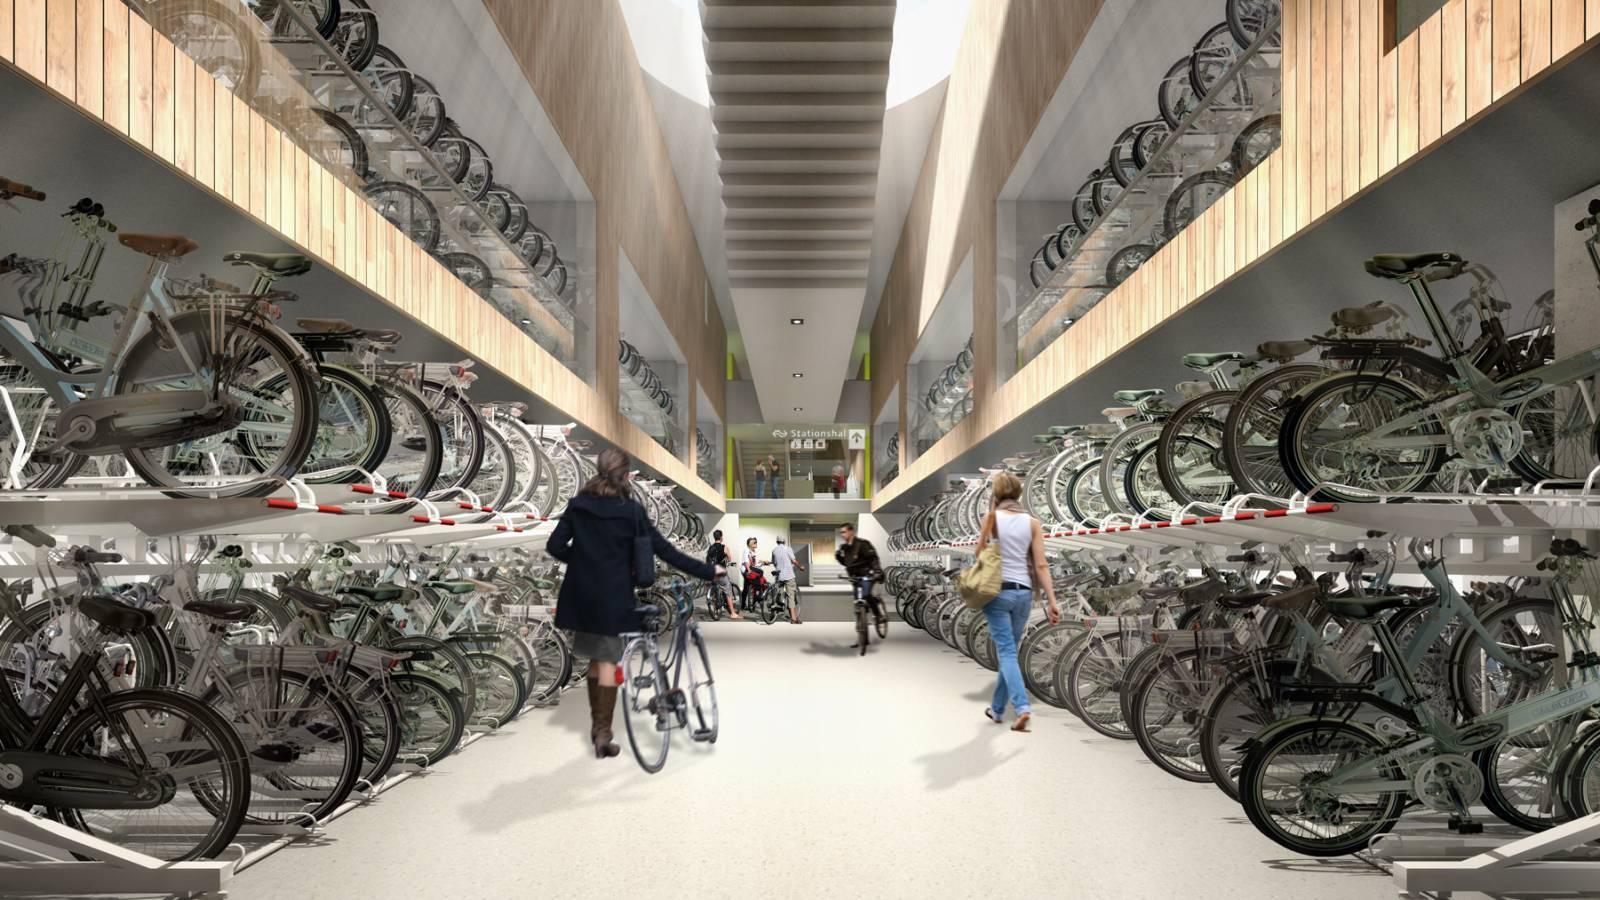 Bicycle Parking Garage In Utrecht, Netherlands